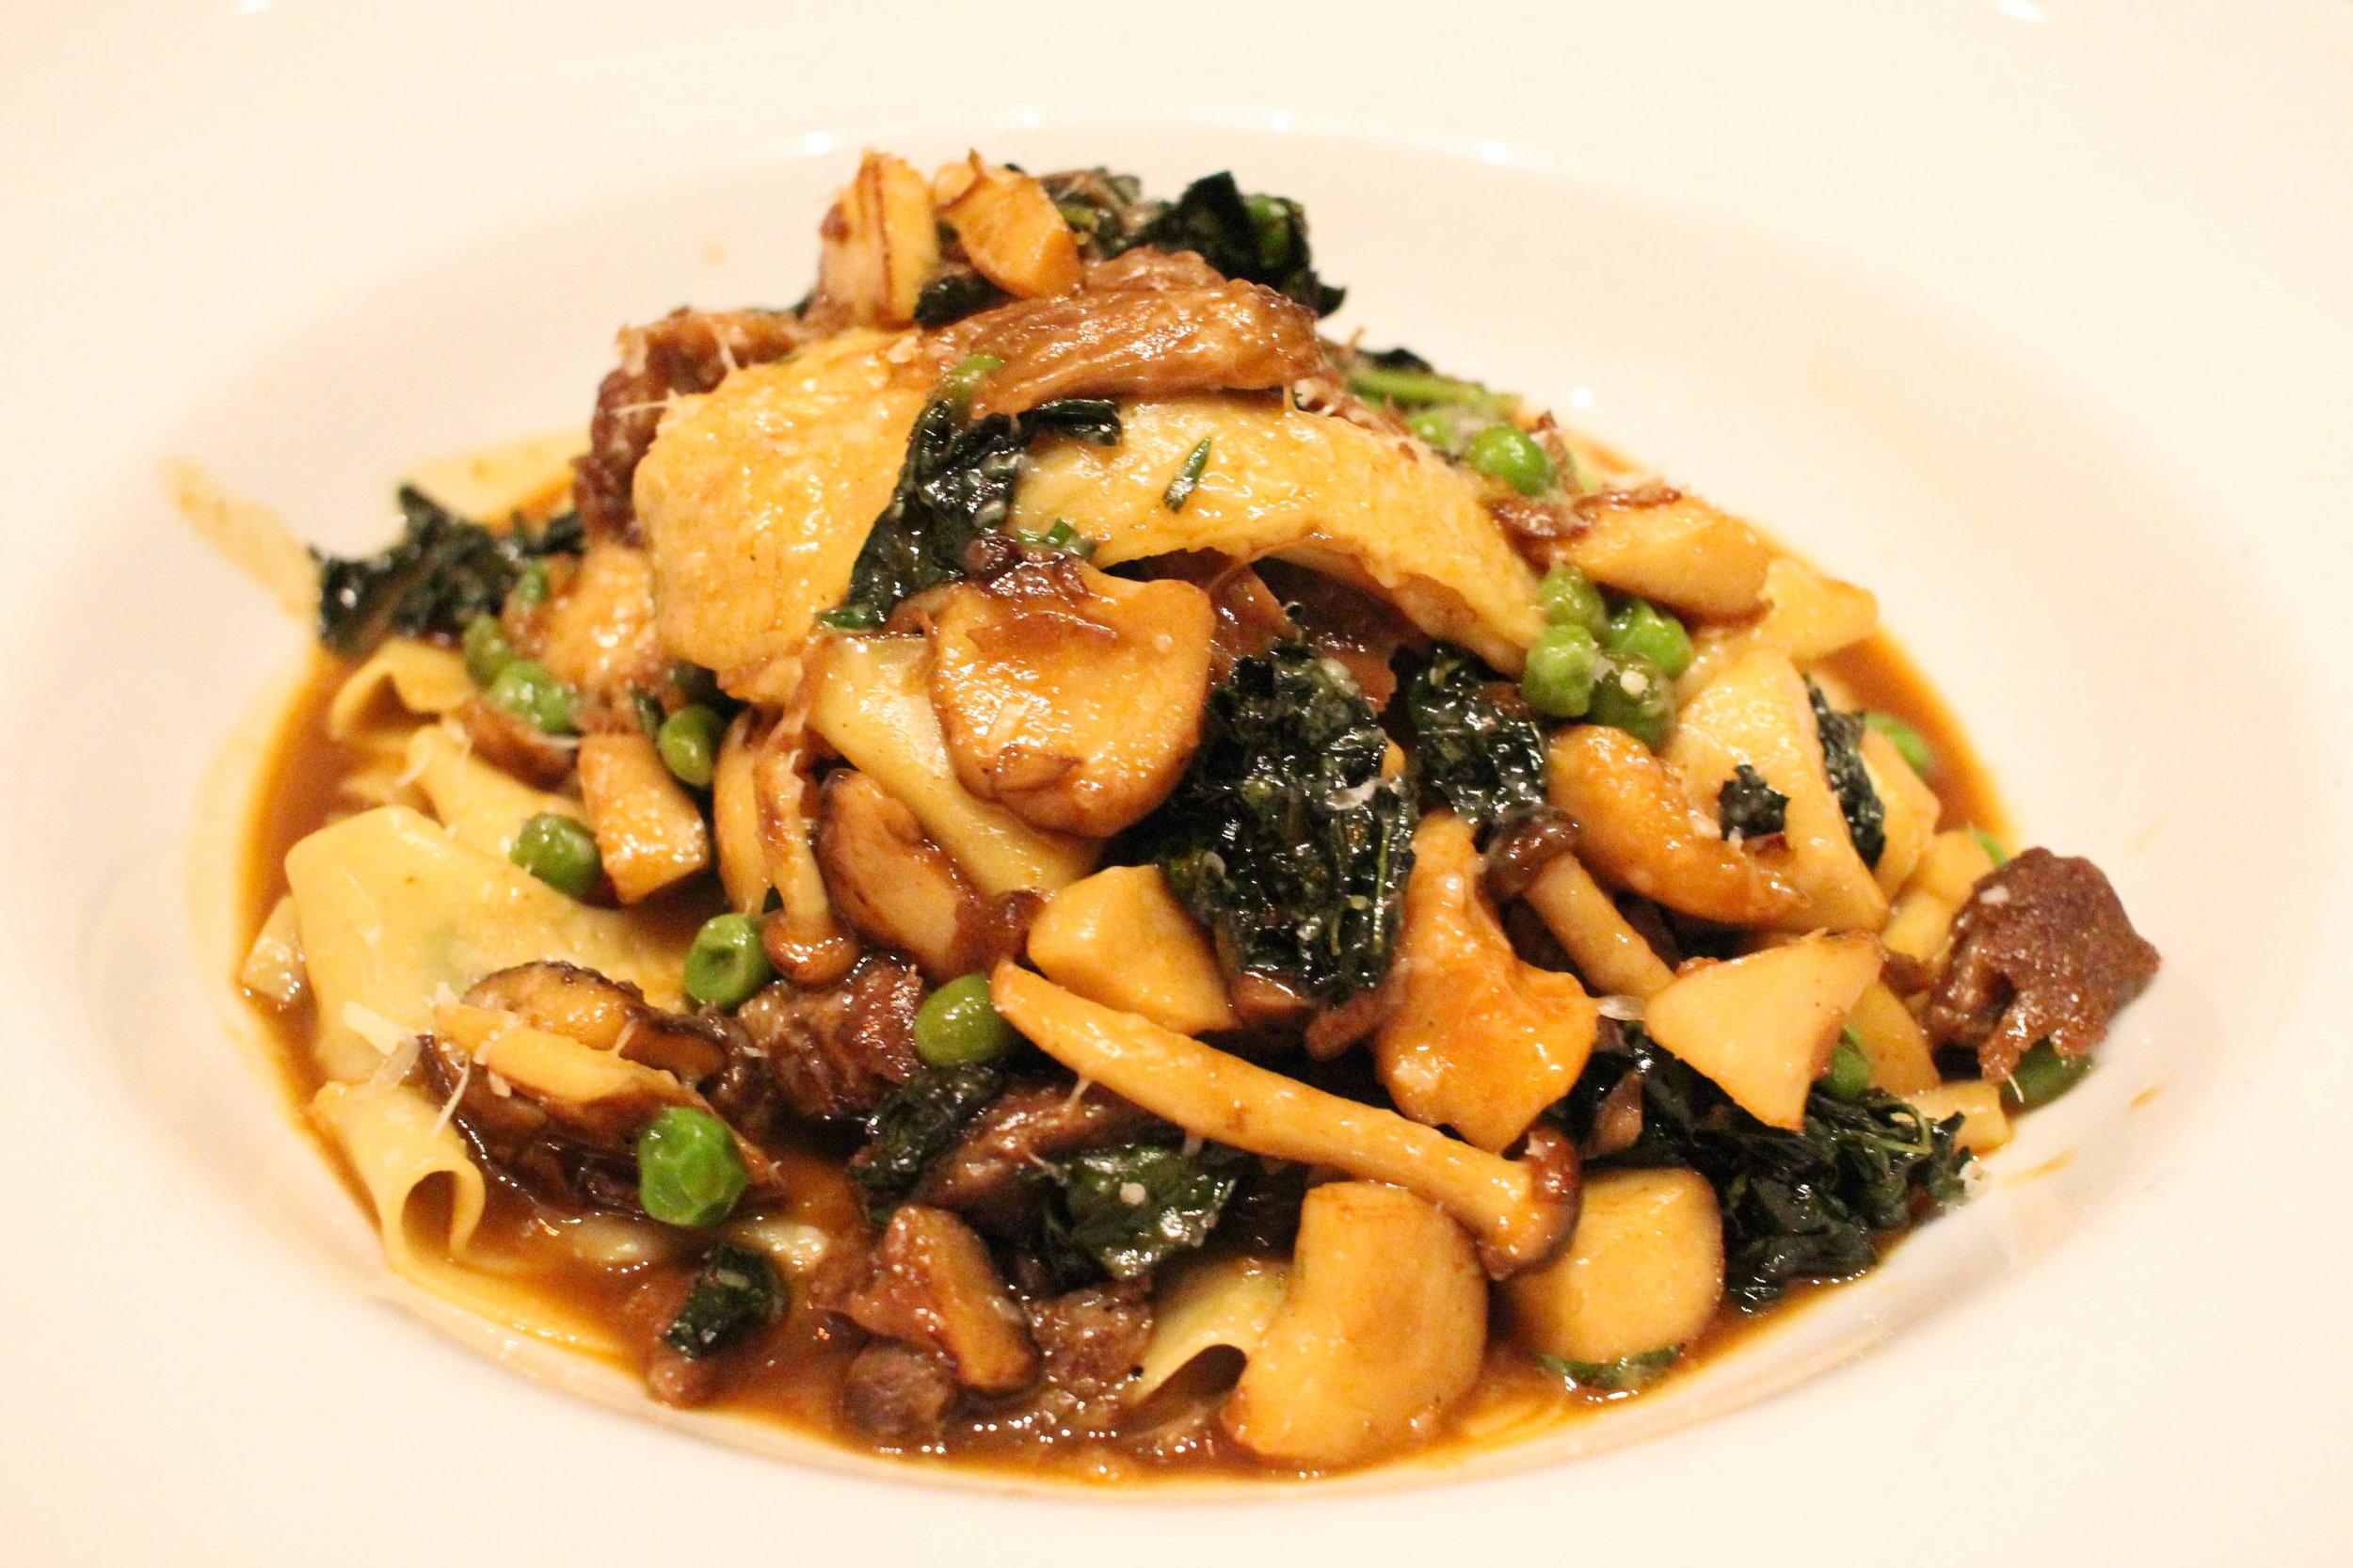 Pappardelle with pork cheeks, peas, kale, brown beech mushrooms, tarragon, pecorino